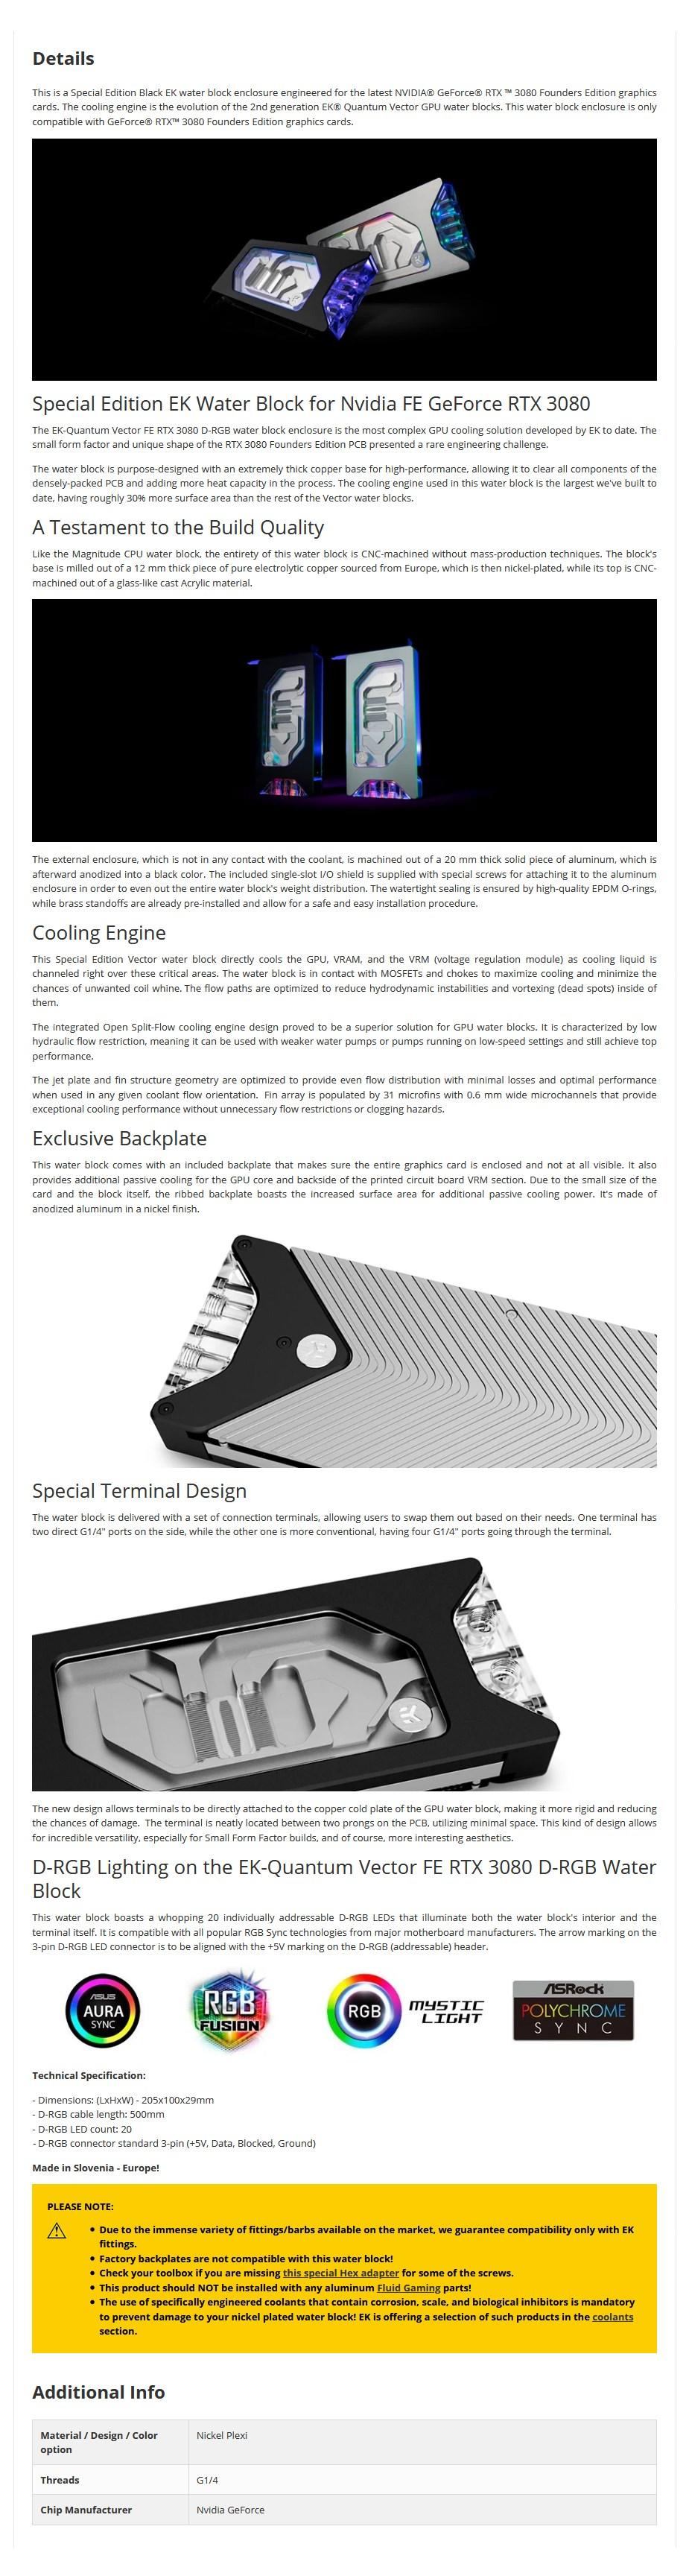 EKWB EK-Quantum Vector D-RGB FE RTX 3080 GPU Water Block Black Special Edition - Overview 1